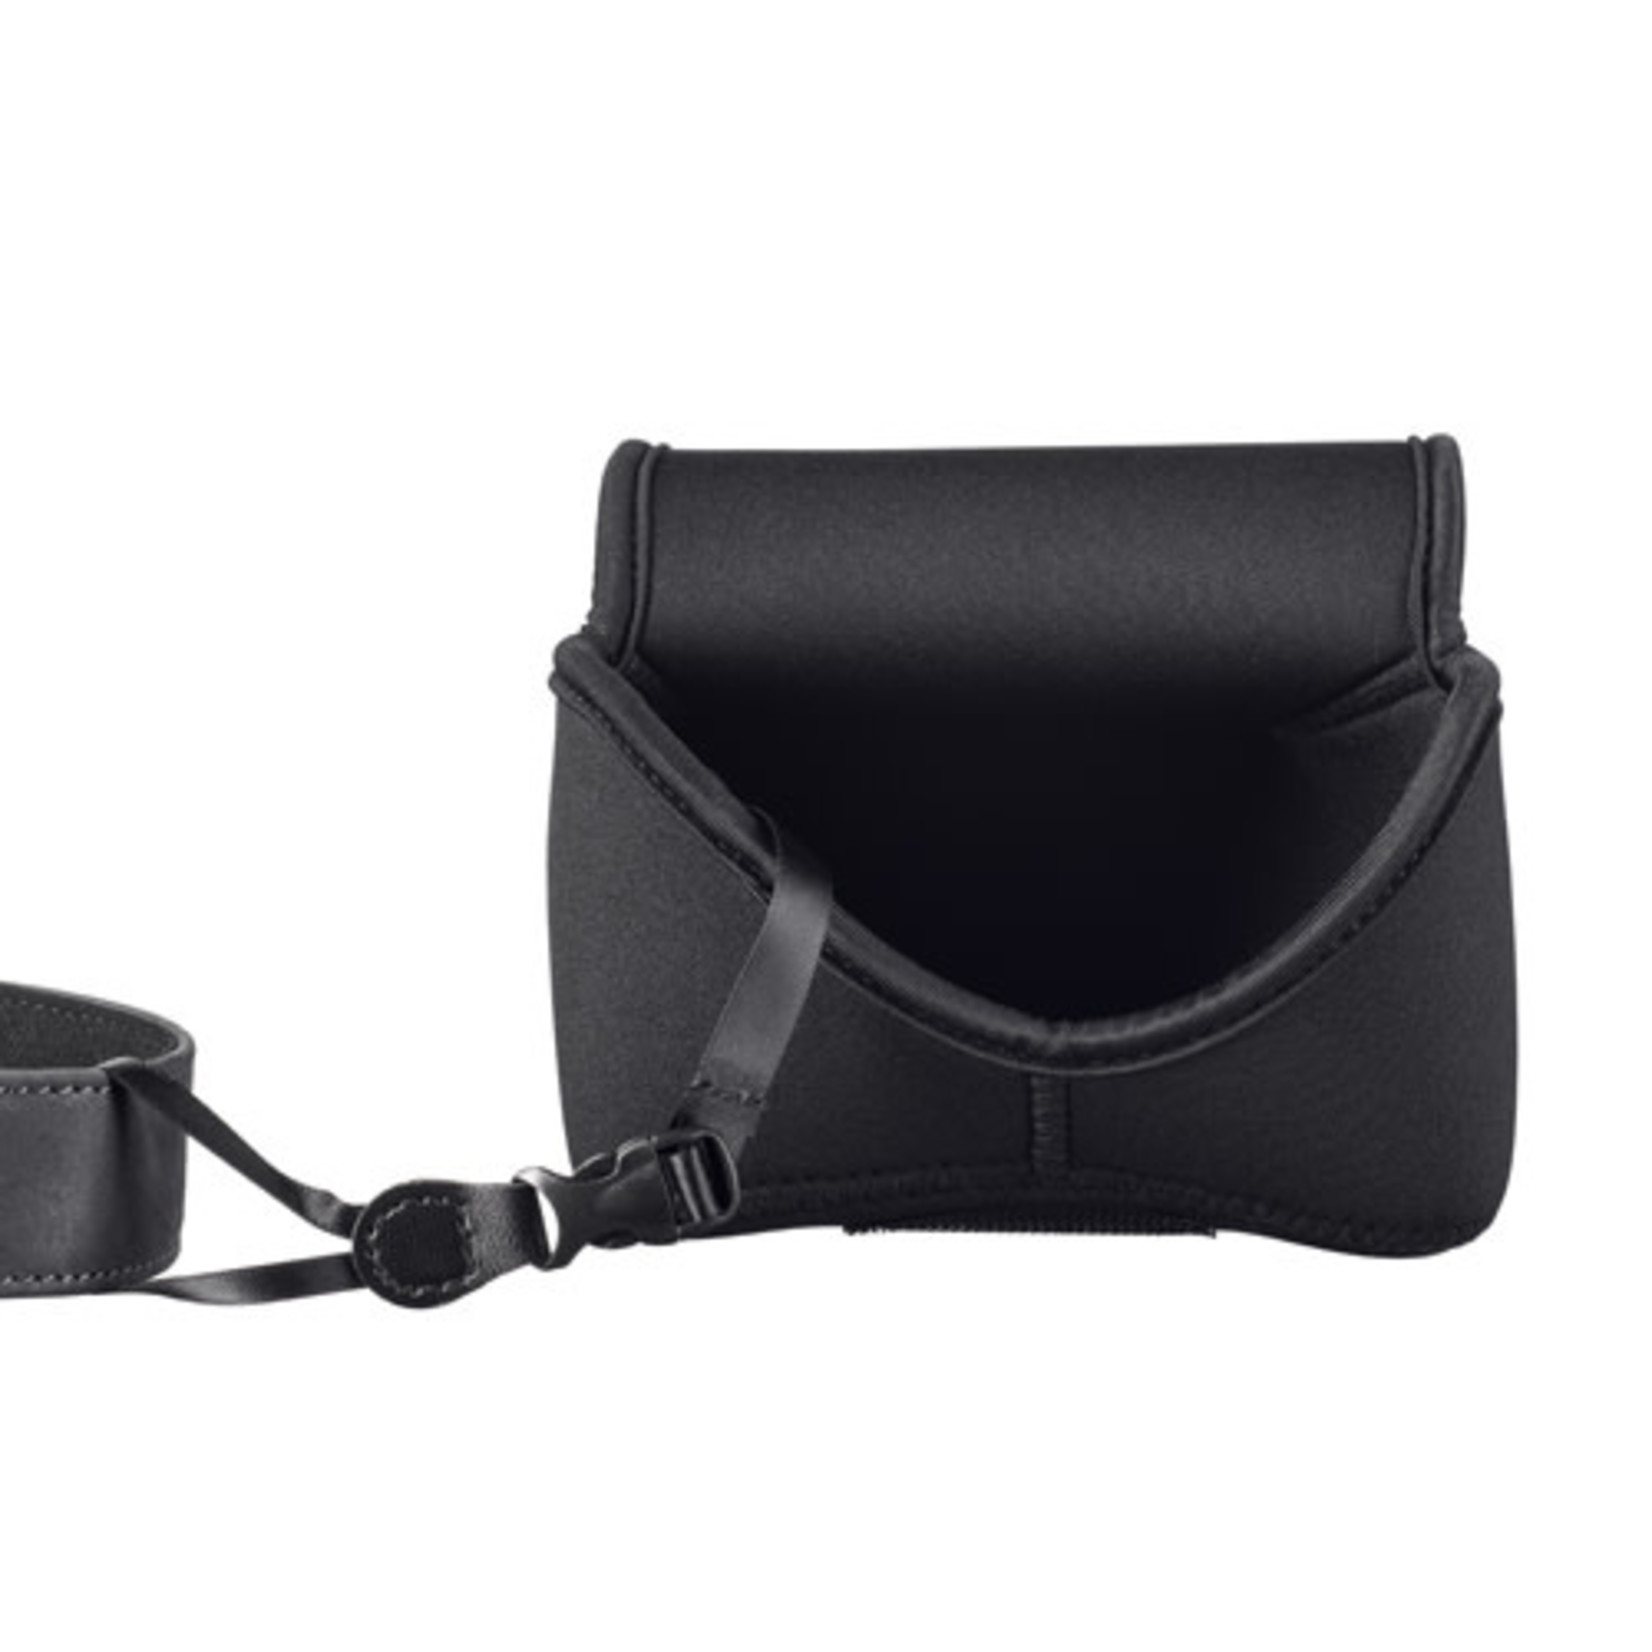 ProMaster Neoprene Mirrorless Camera Pouch - Medium